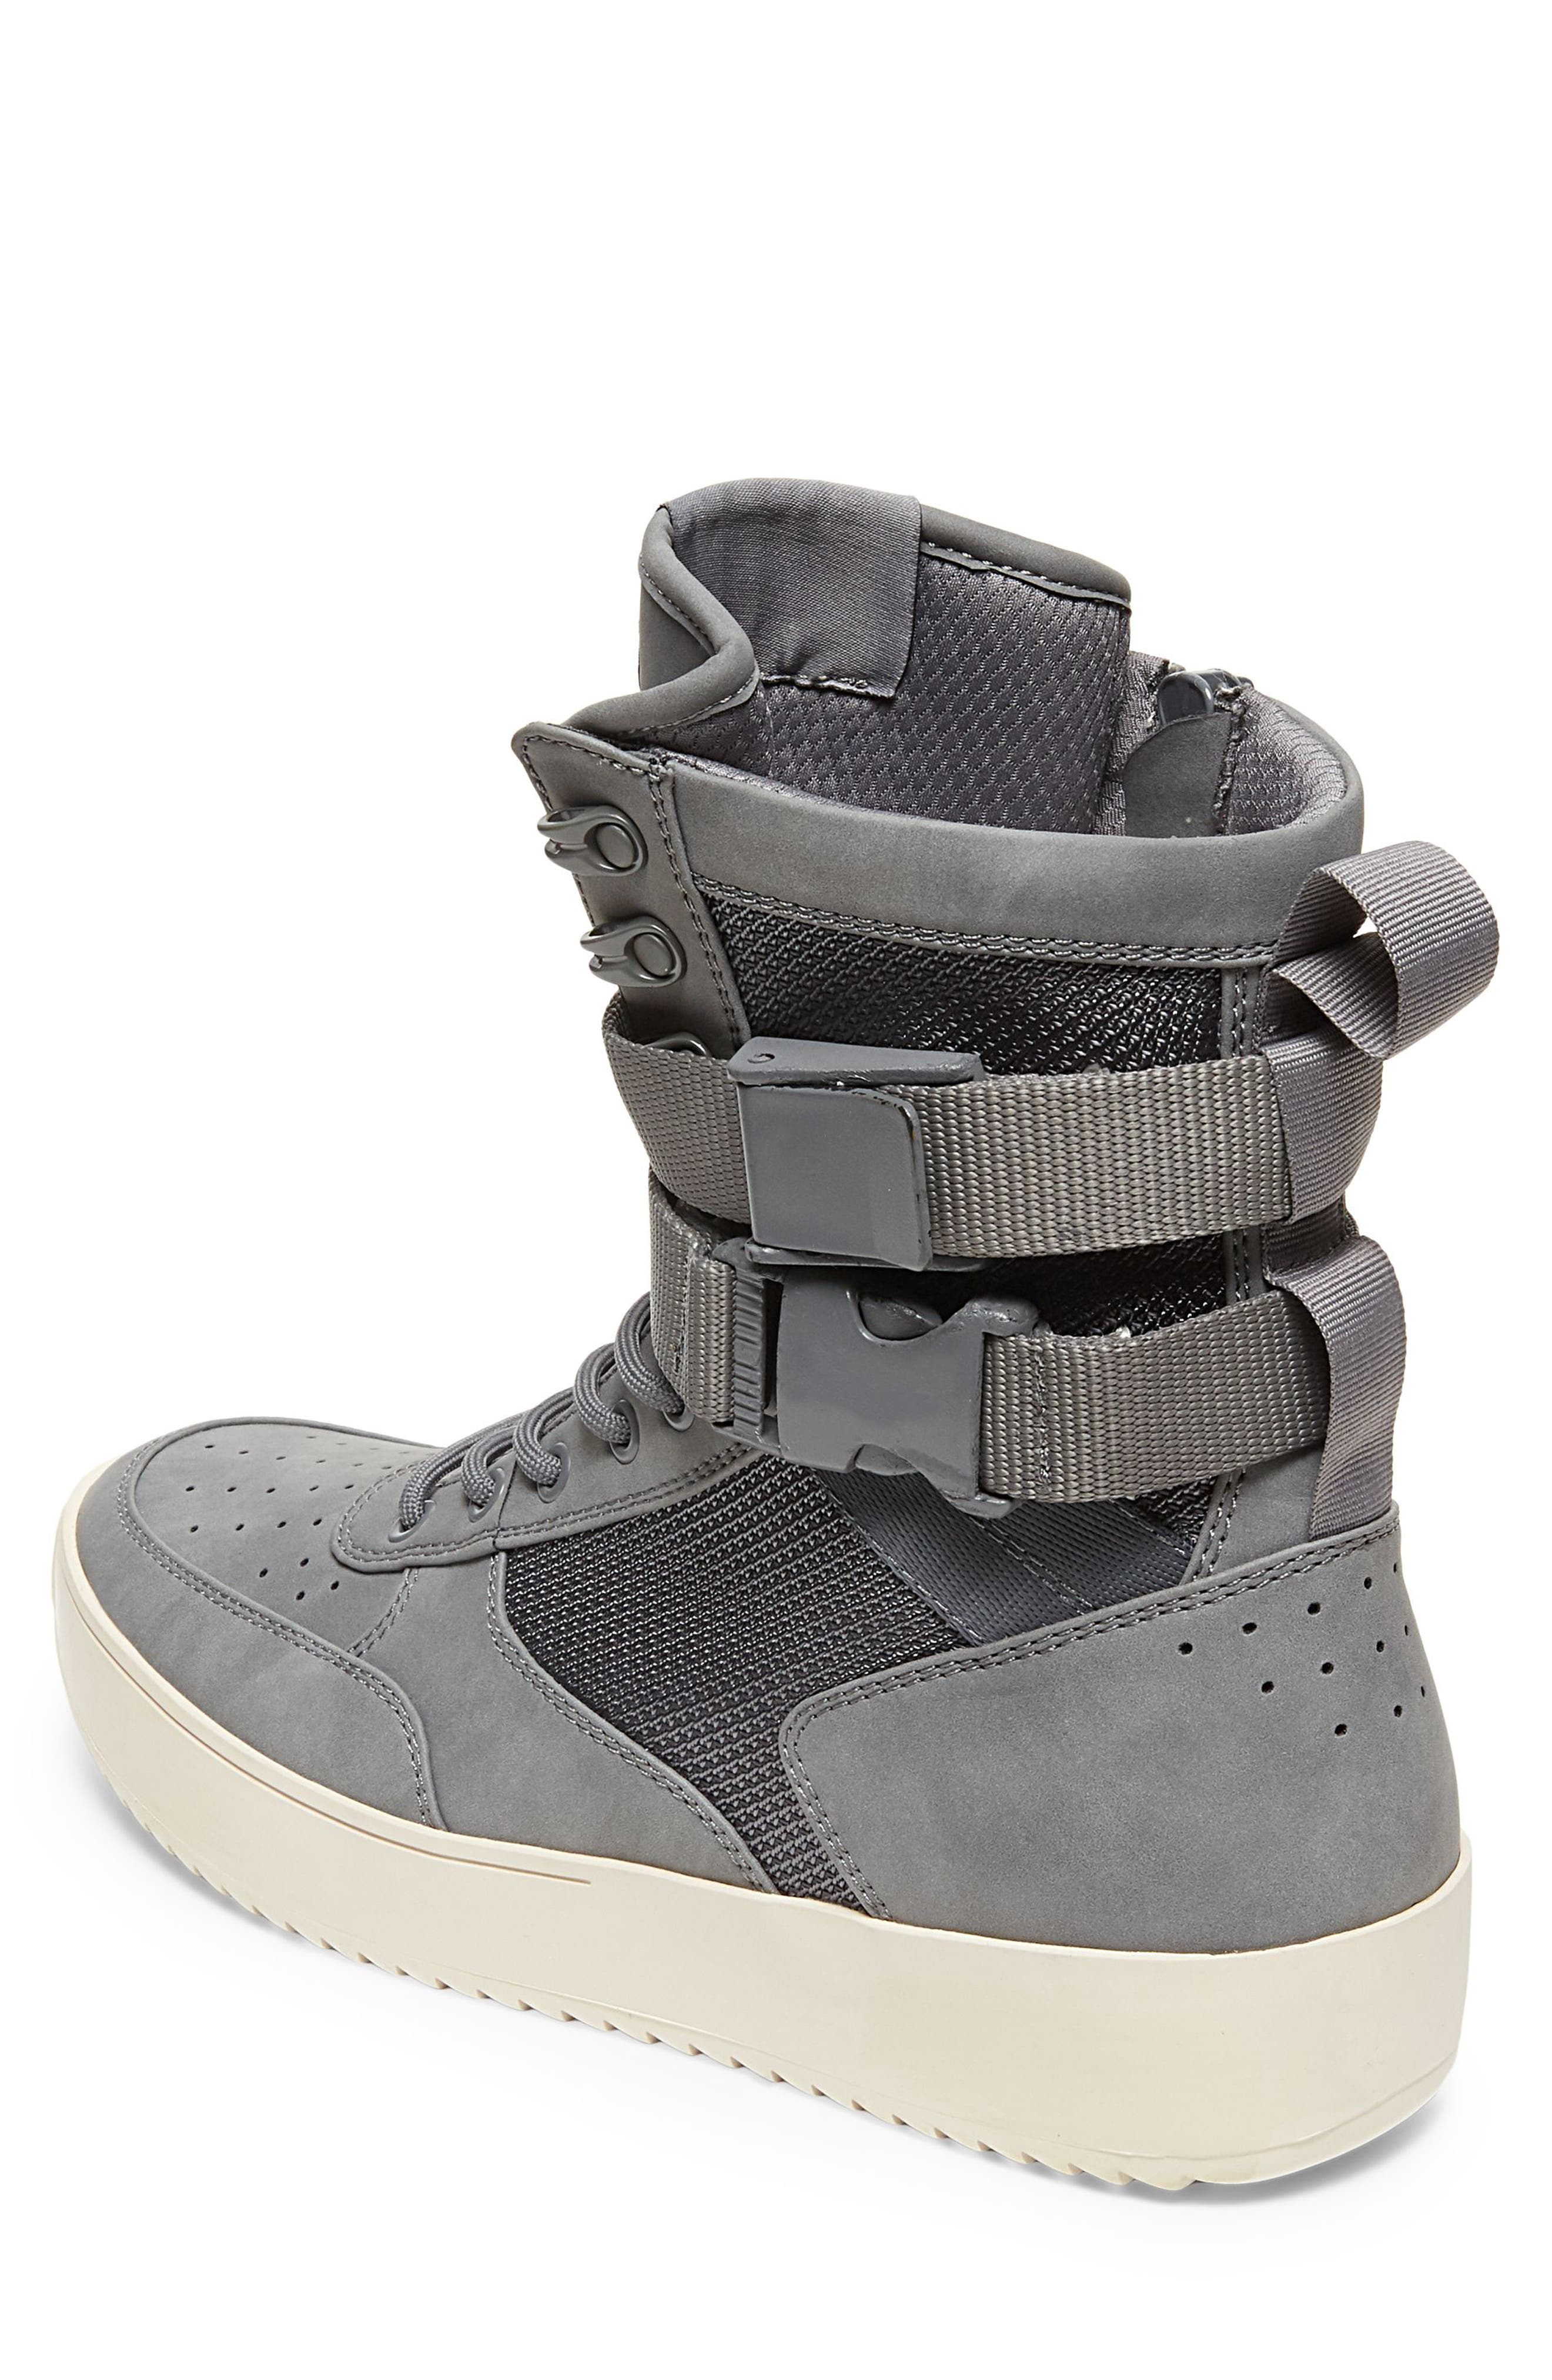 Zeroday Sneaker,                             Alternate thumbnail 5, color,